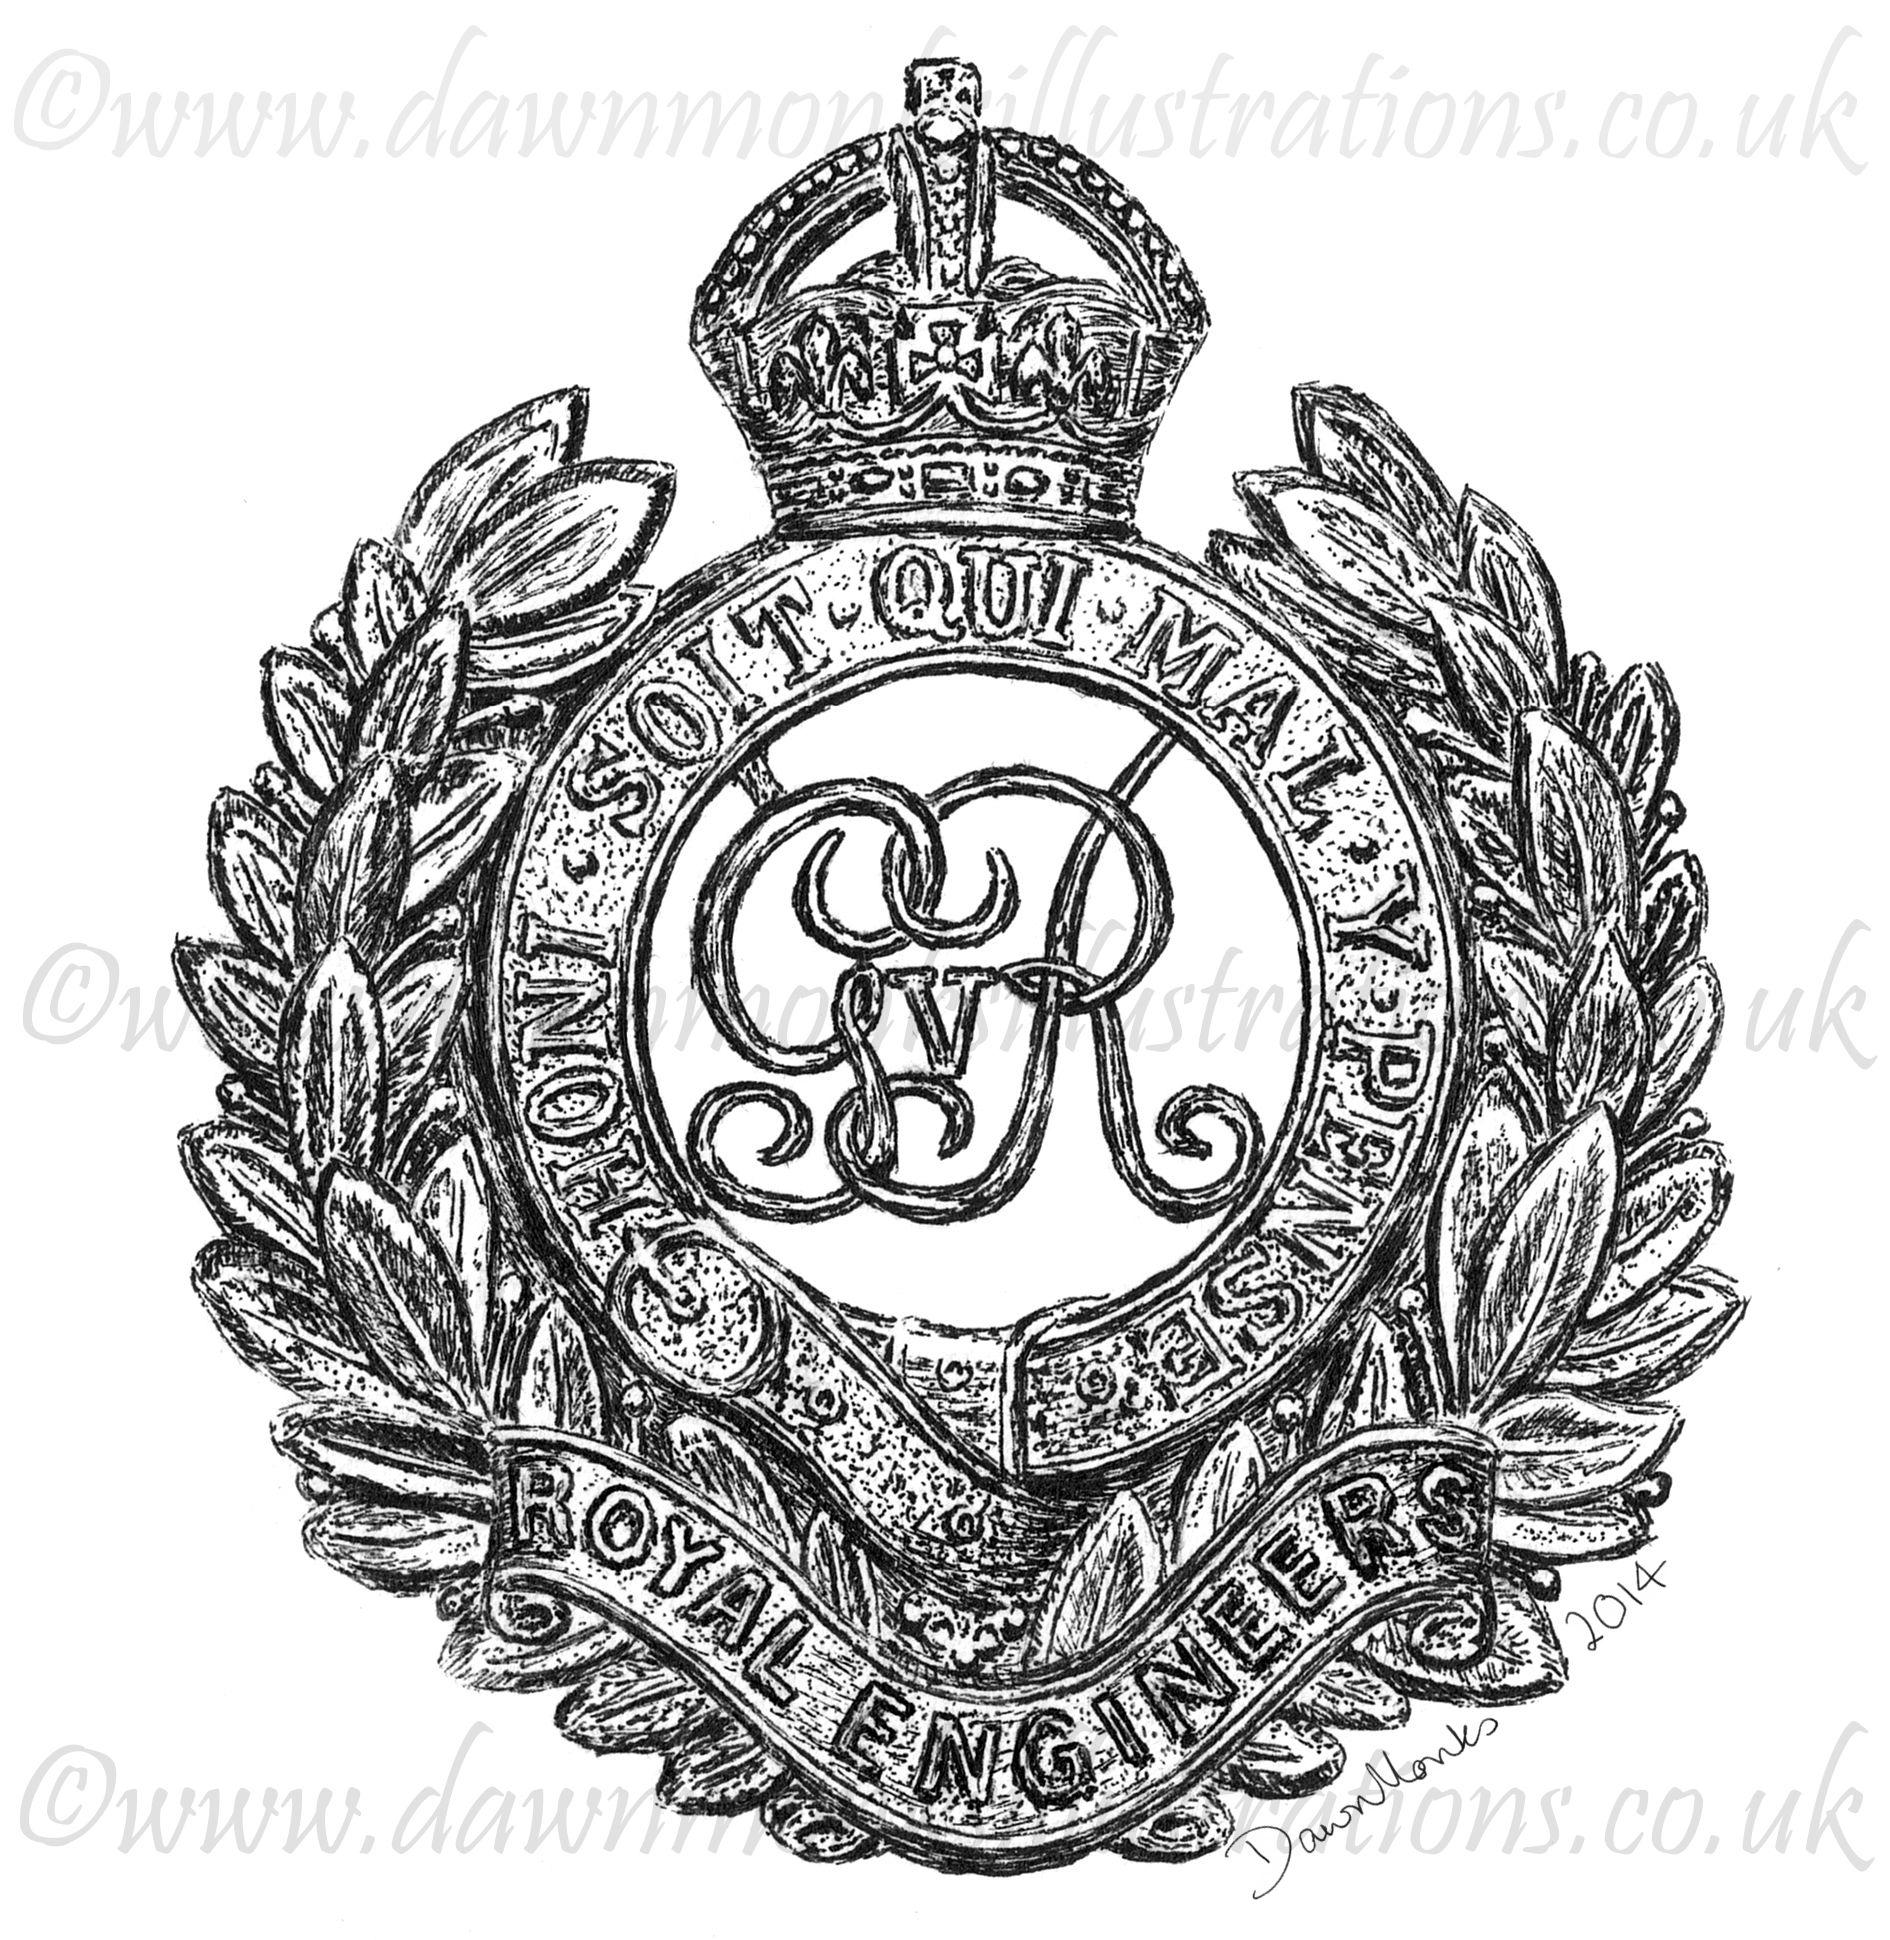 1890x1940 Royal Engineers Ww1 Cap Badge Design Baseball Cap Dawn Monks